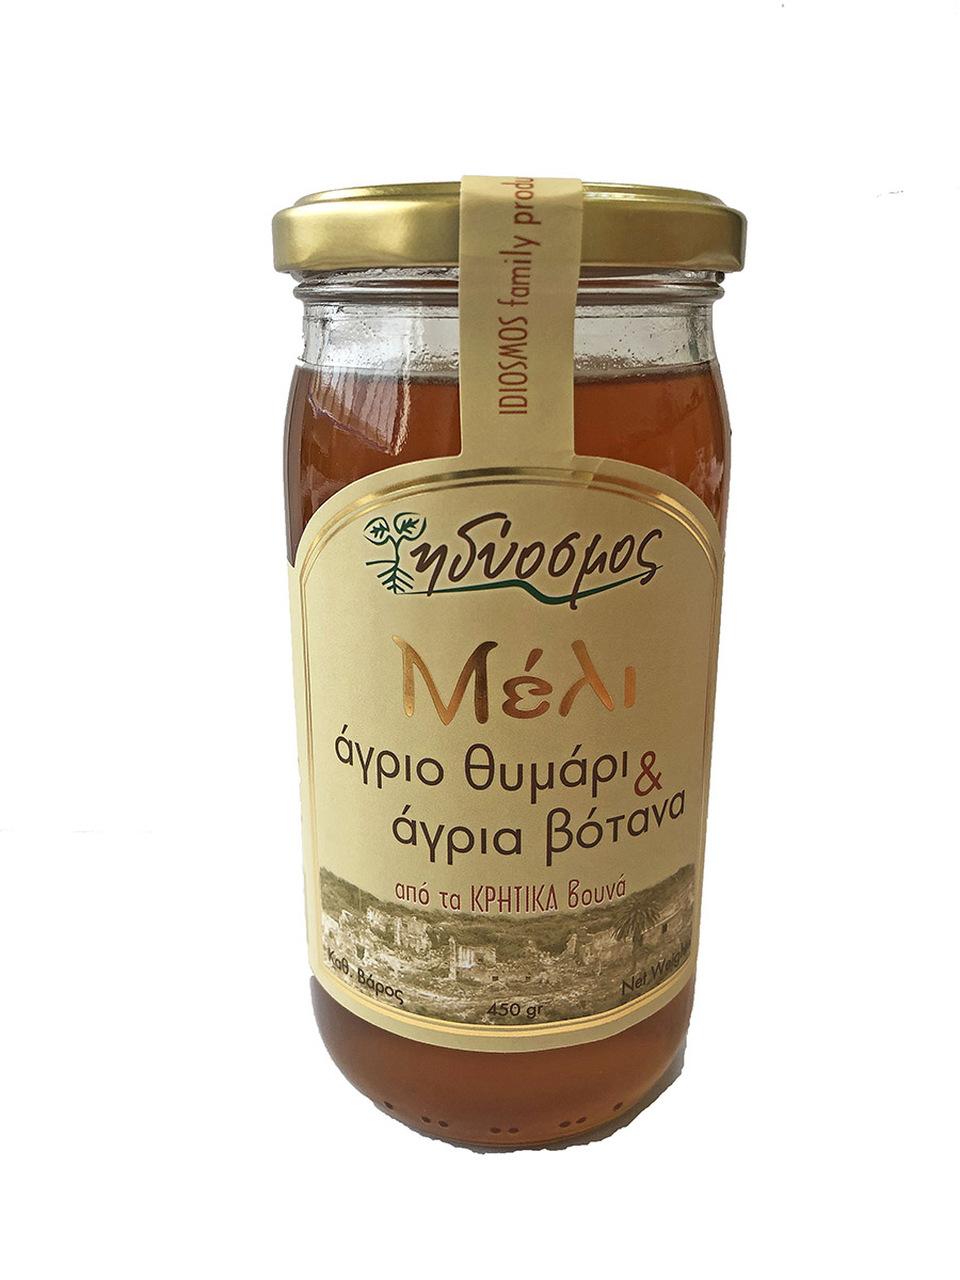 Idiosmos-MIEL-DE-THYM-LE-CAMION-GREC-épicerie-grecque